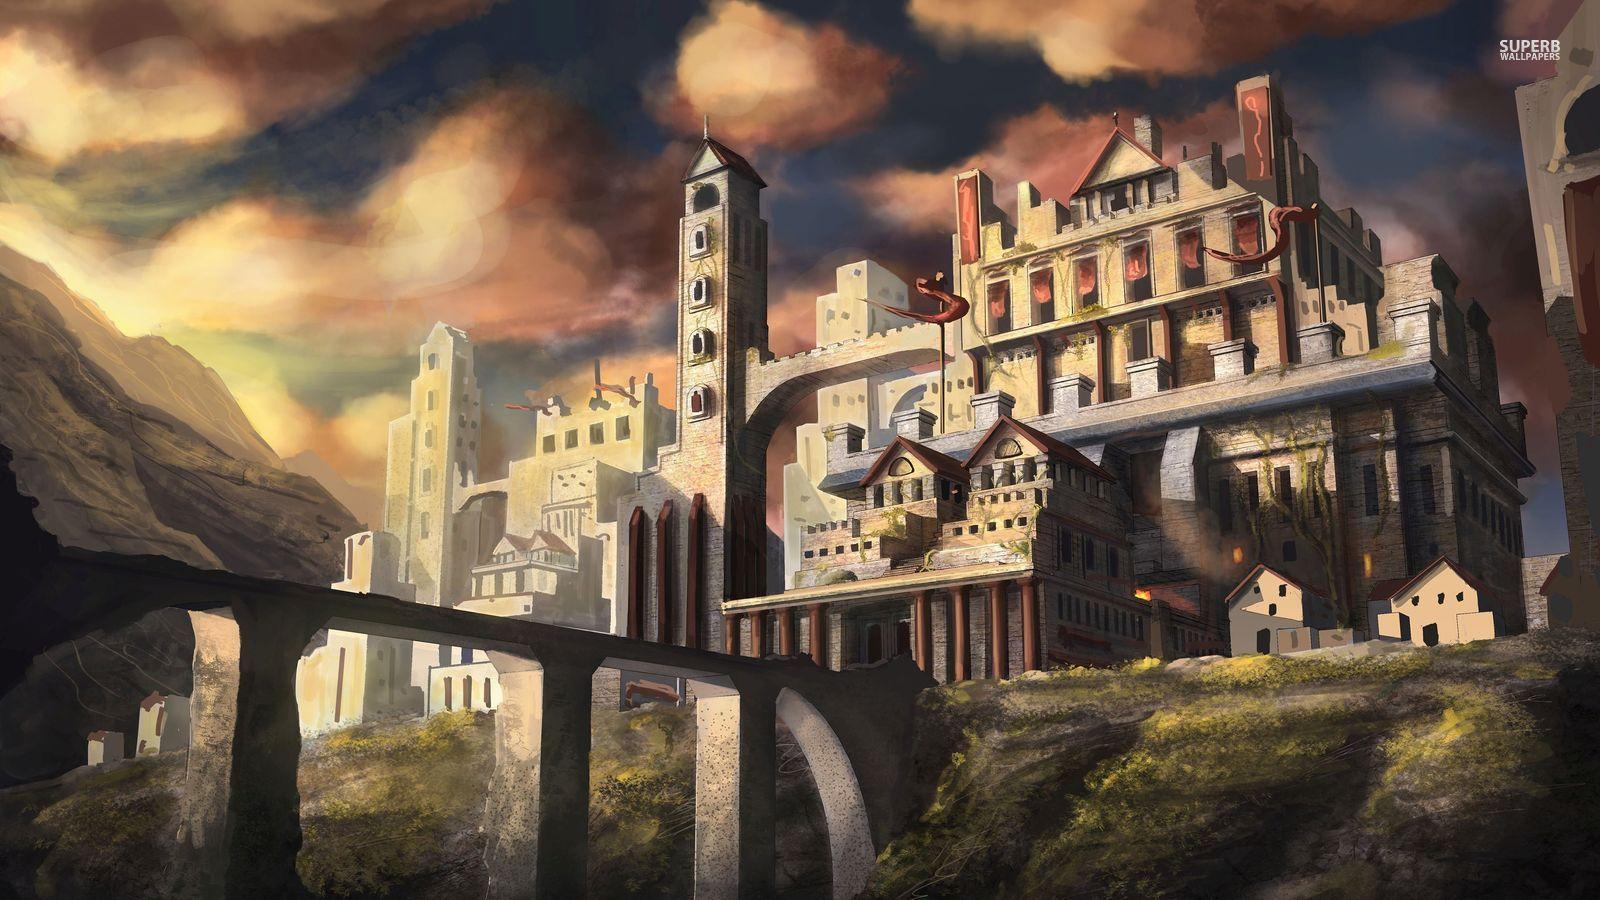 magic castle fantasy world - photo #33